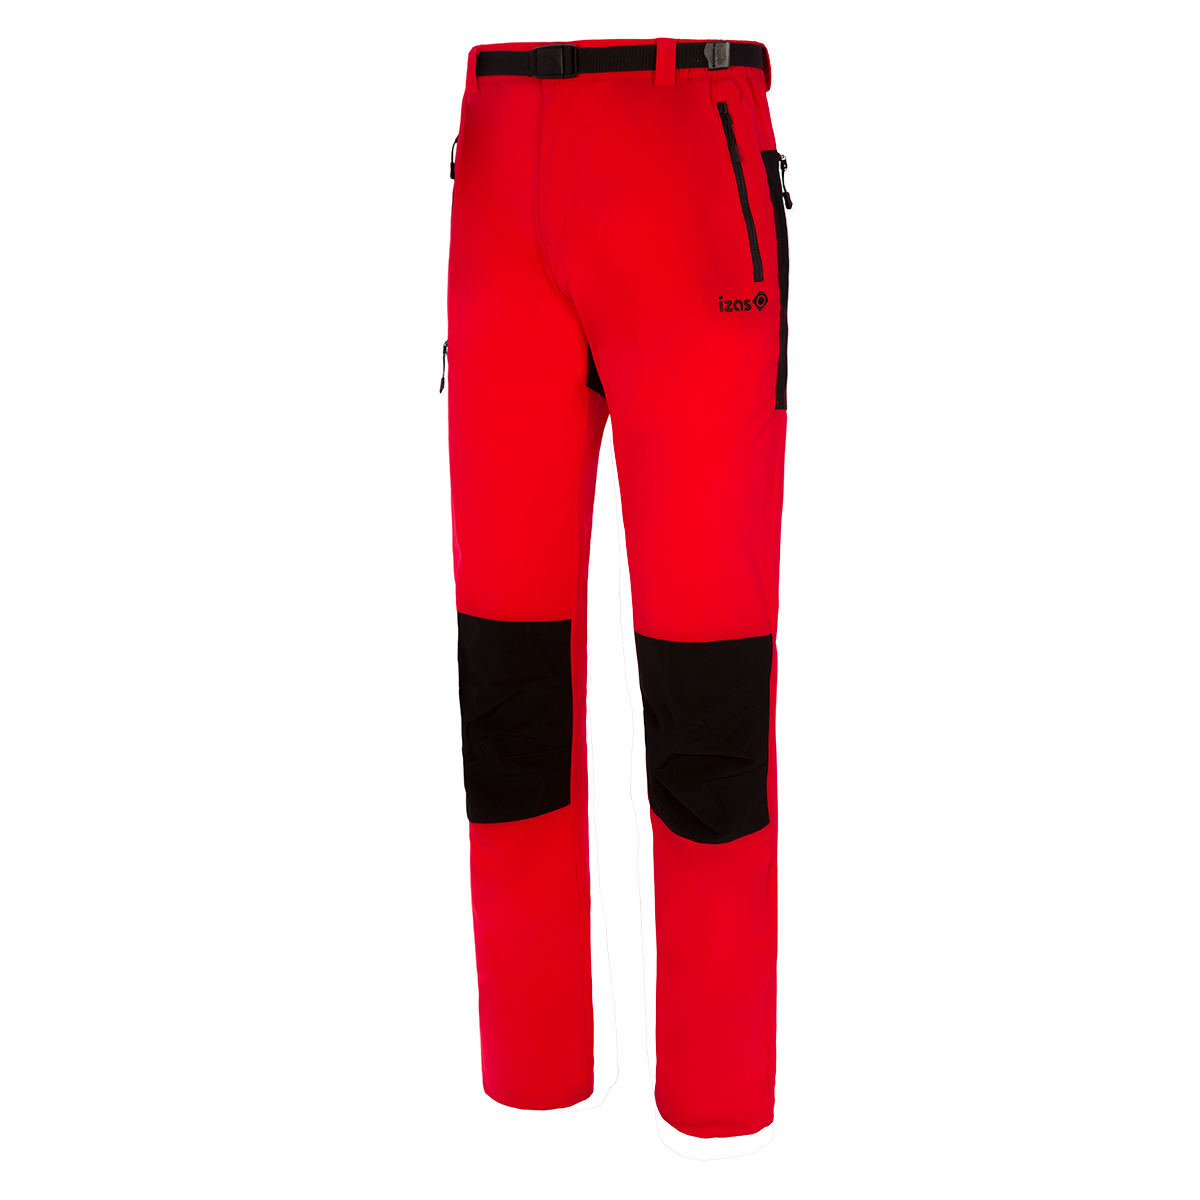 OLVES-RED-BLACK-1